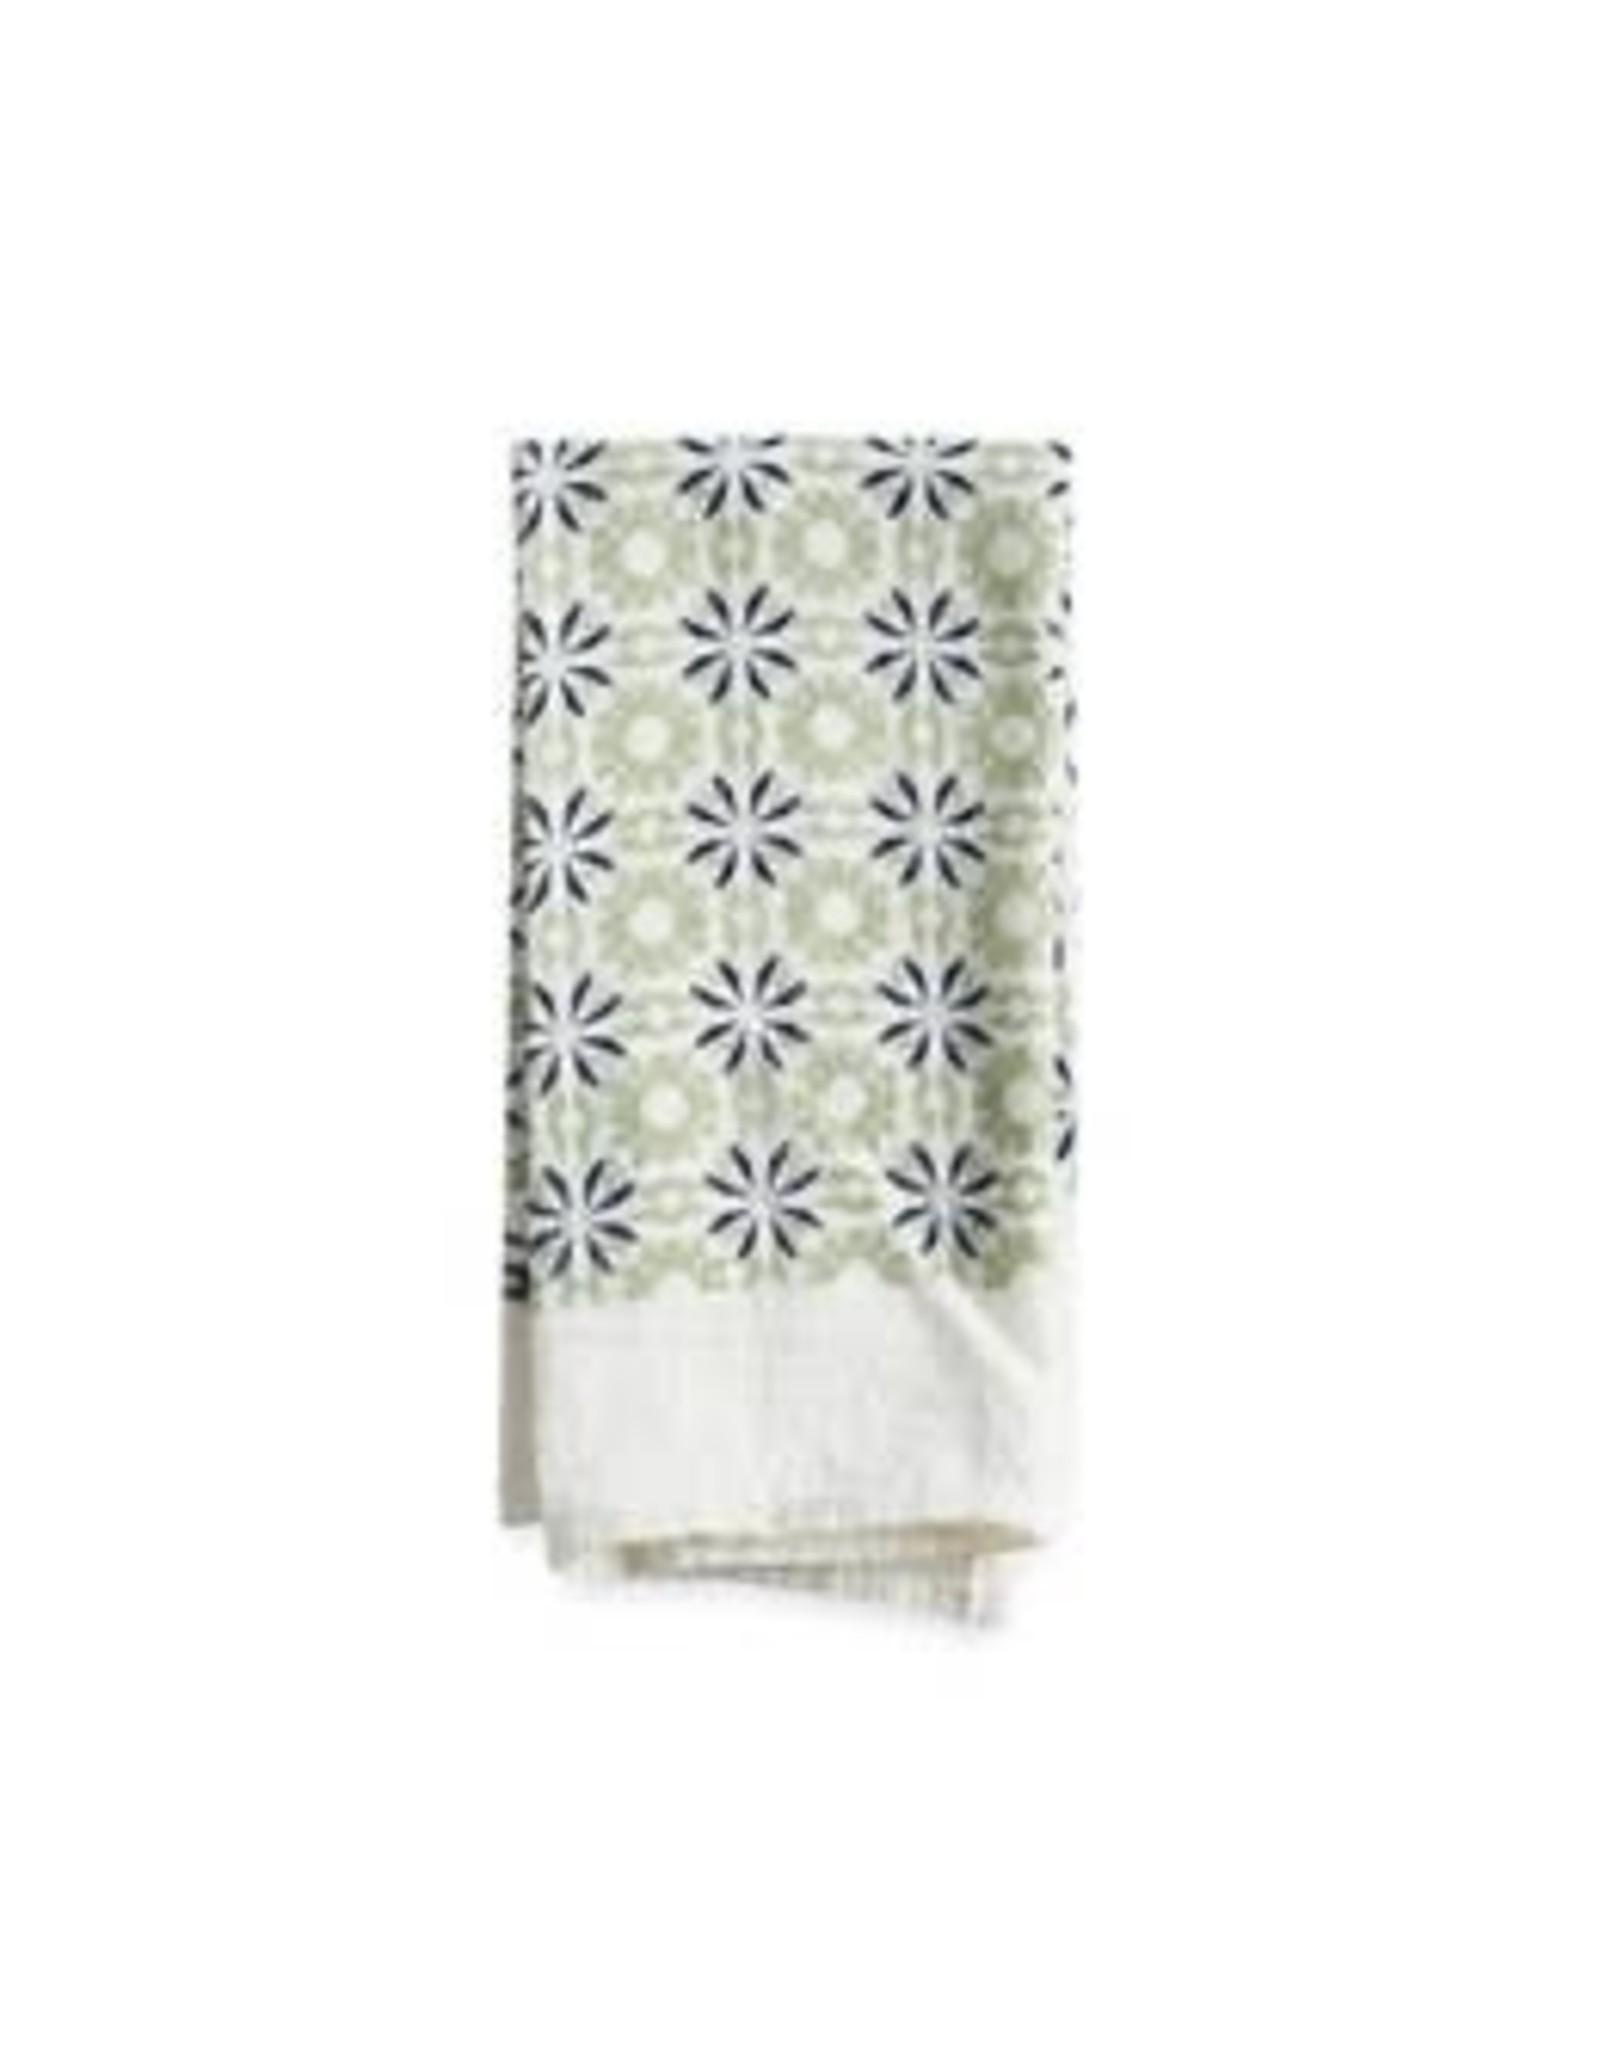 June & December Chicory Napkins Set of 4 - Mint